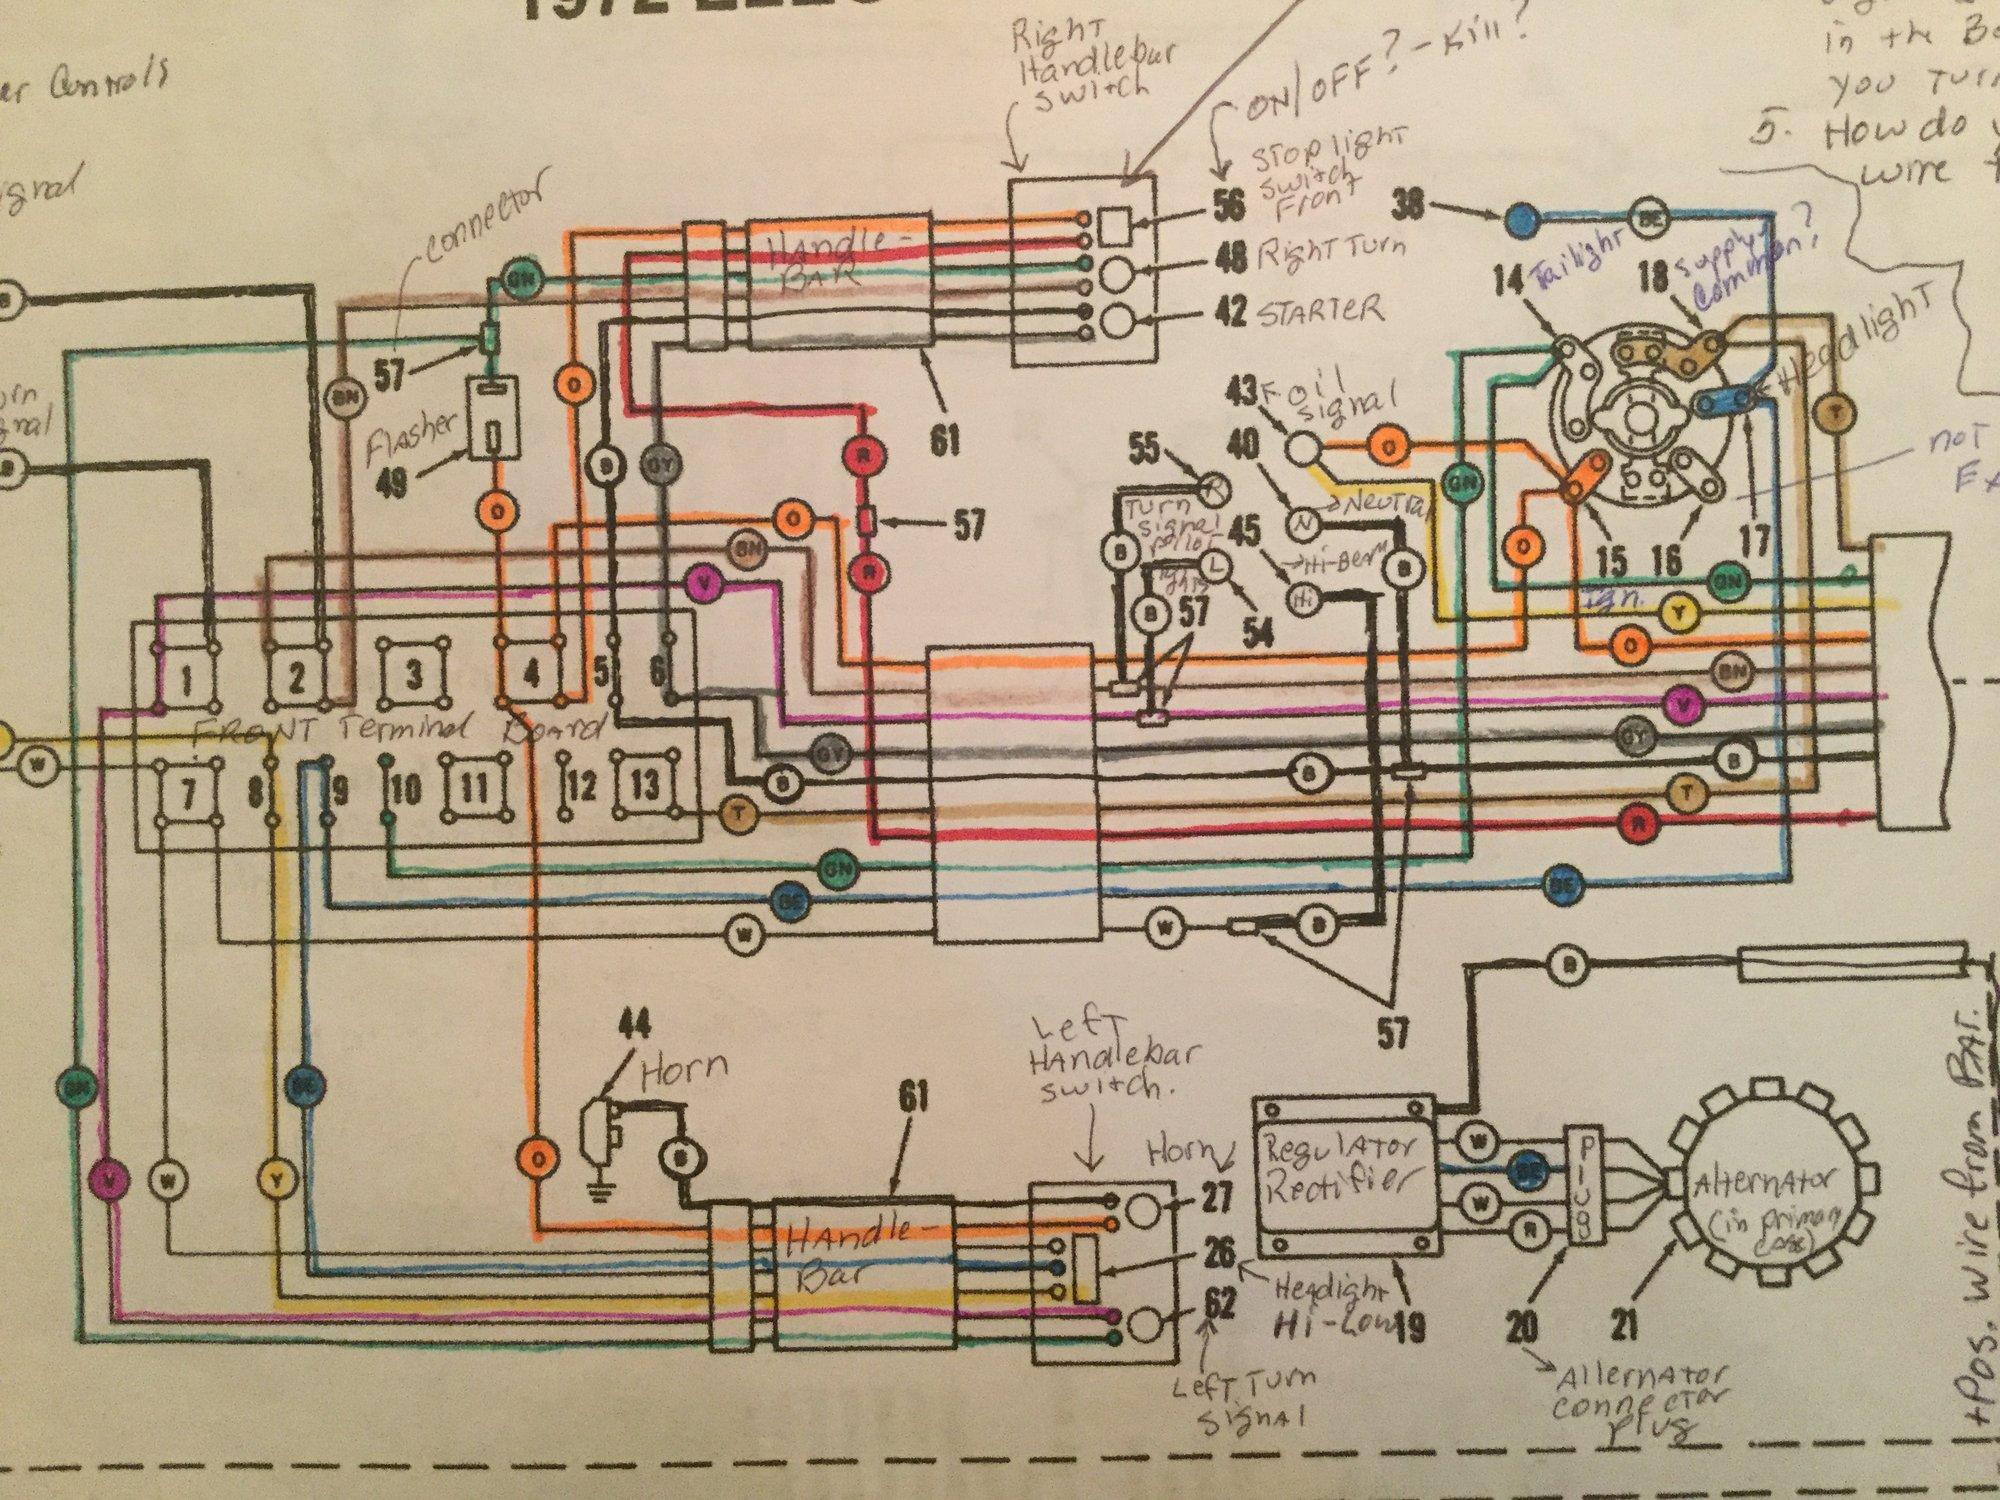 1995 Flht Wiring Diagram Honda Ntv 600 Revere Fuse Box Cover Vww 69 Ab12 Jeanjaures37 Fr